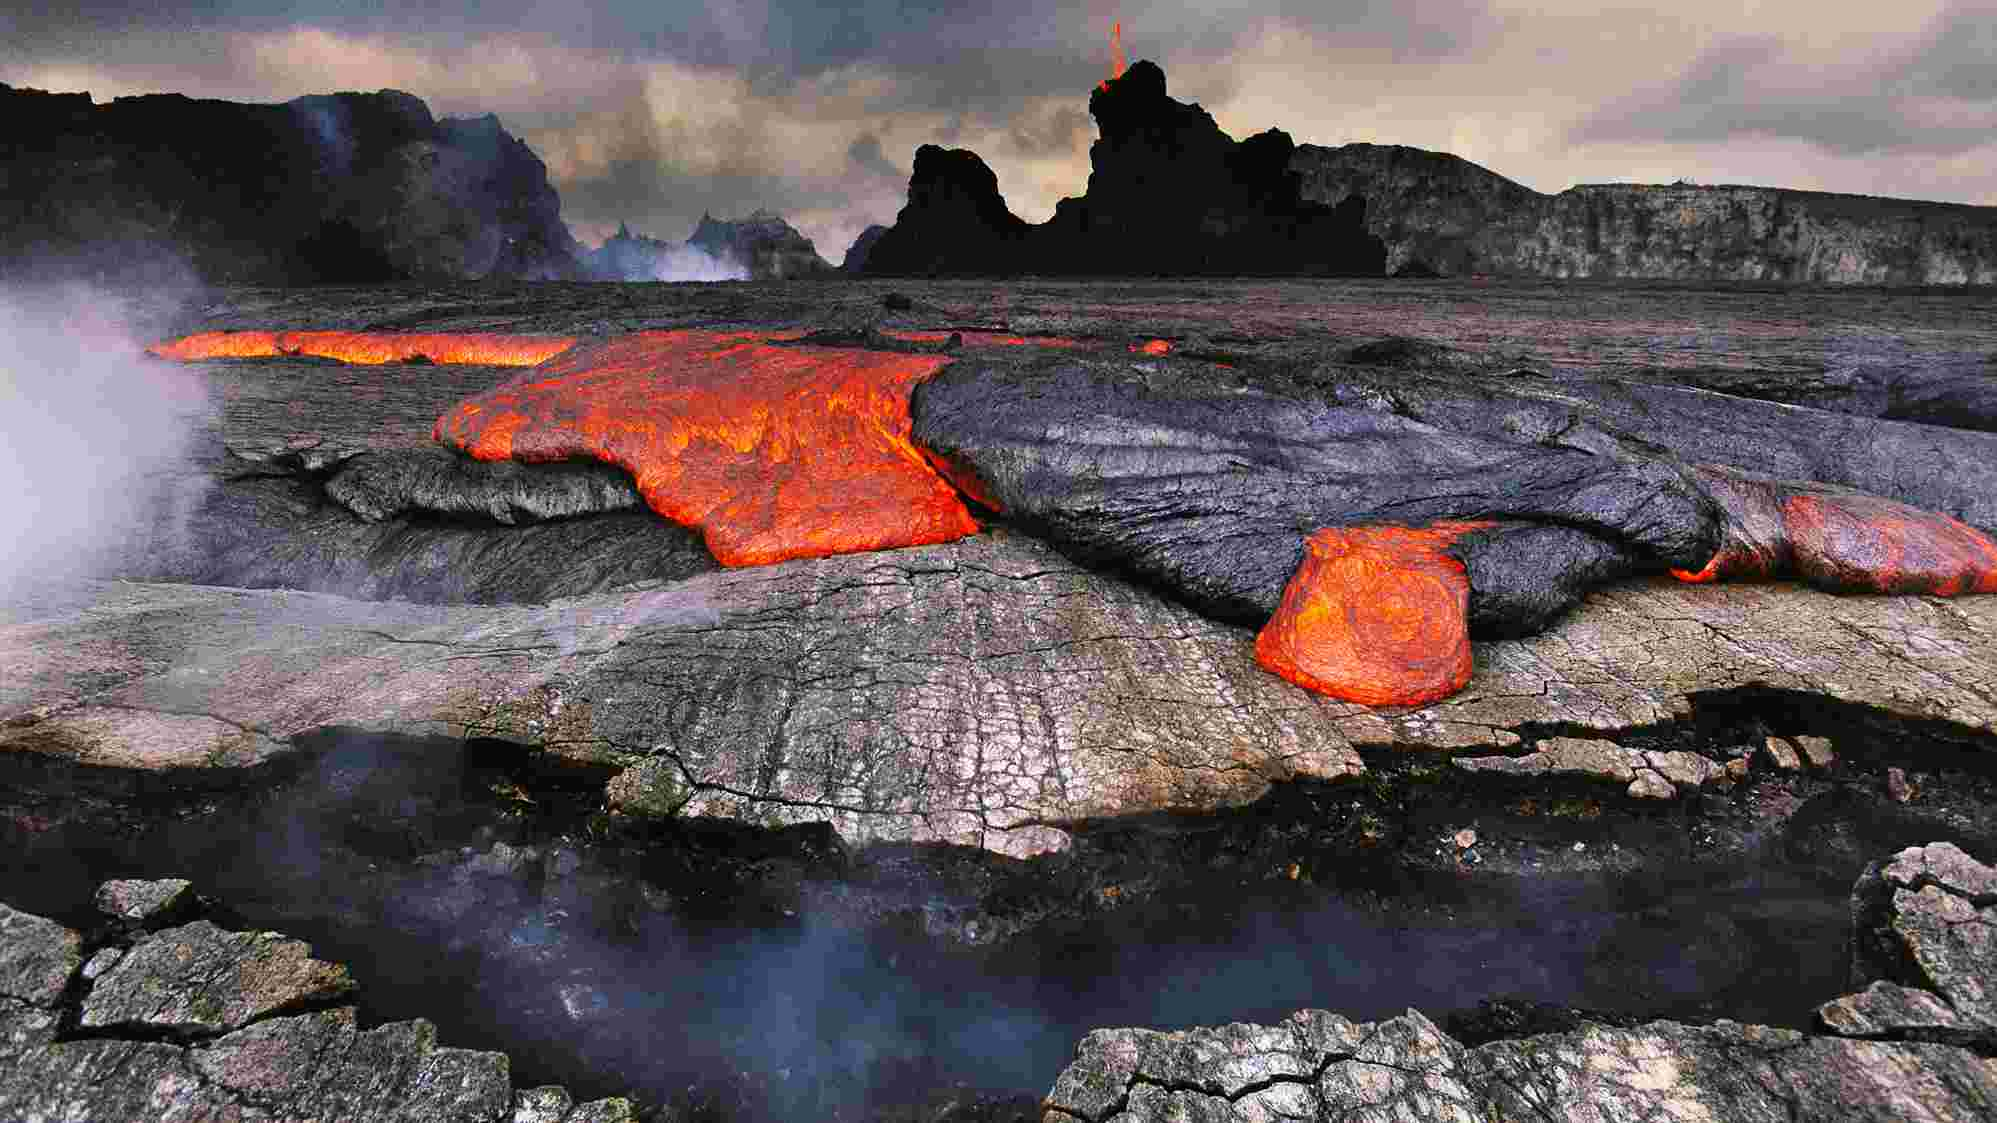 Hawaii volcano park cgtn.jpg